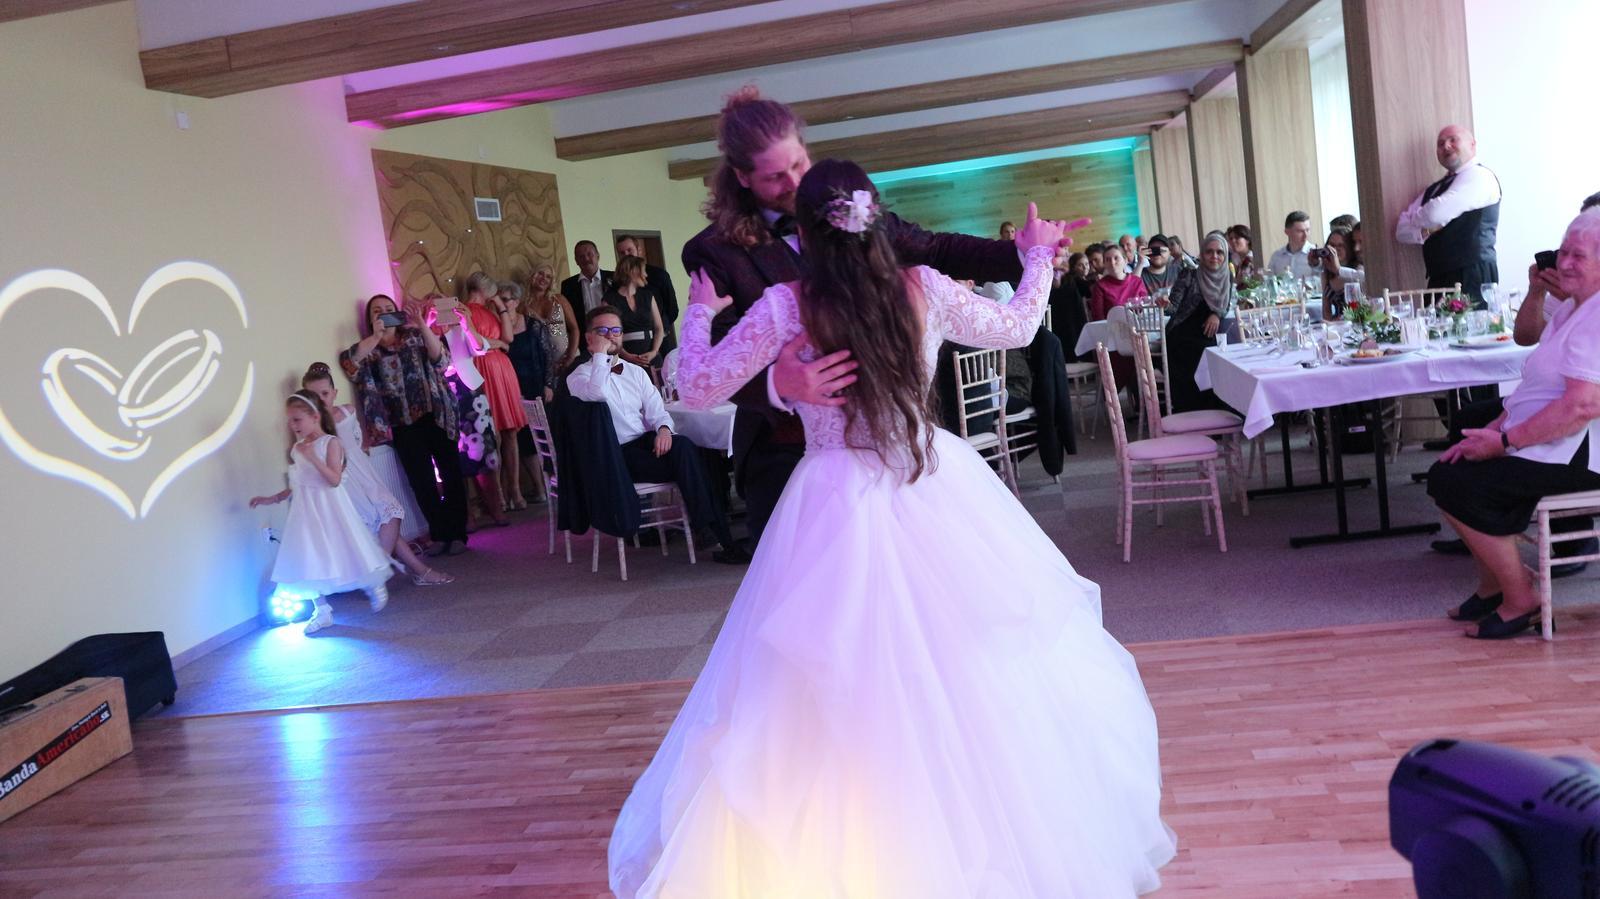 Djka eLLy d - svadba Hotel Kochau Kováčová - dj eLLy d